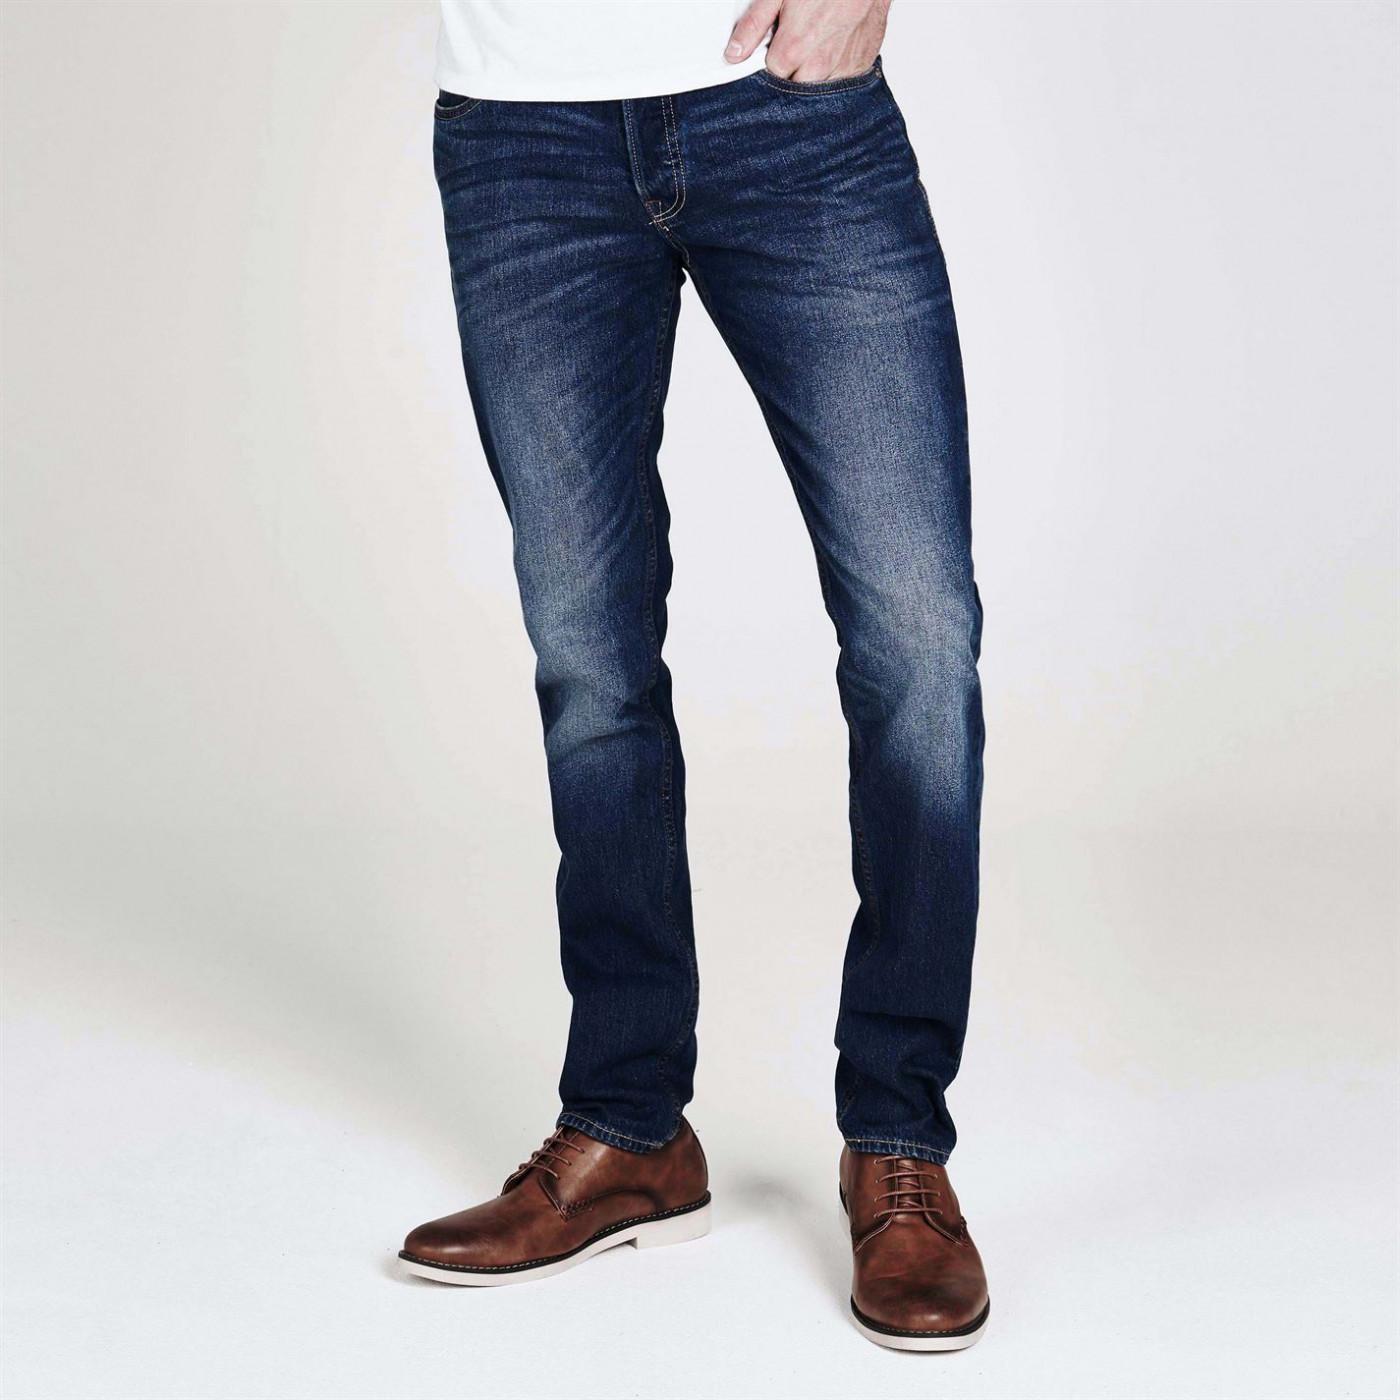 Jack and Jones Jeans Intelligence Tim Slim Mens Jeans